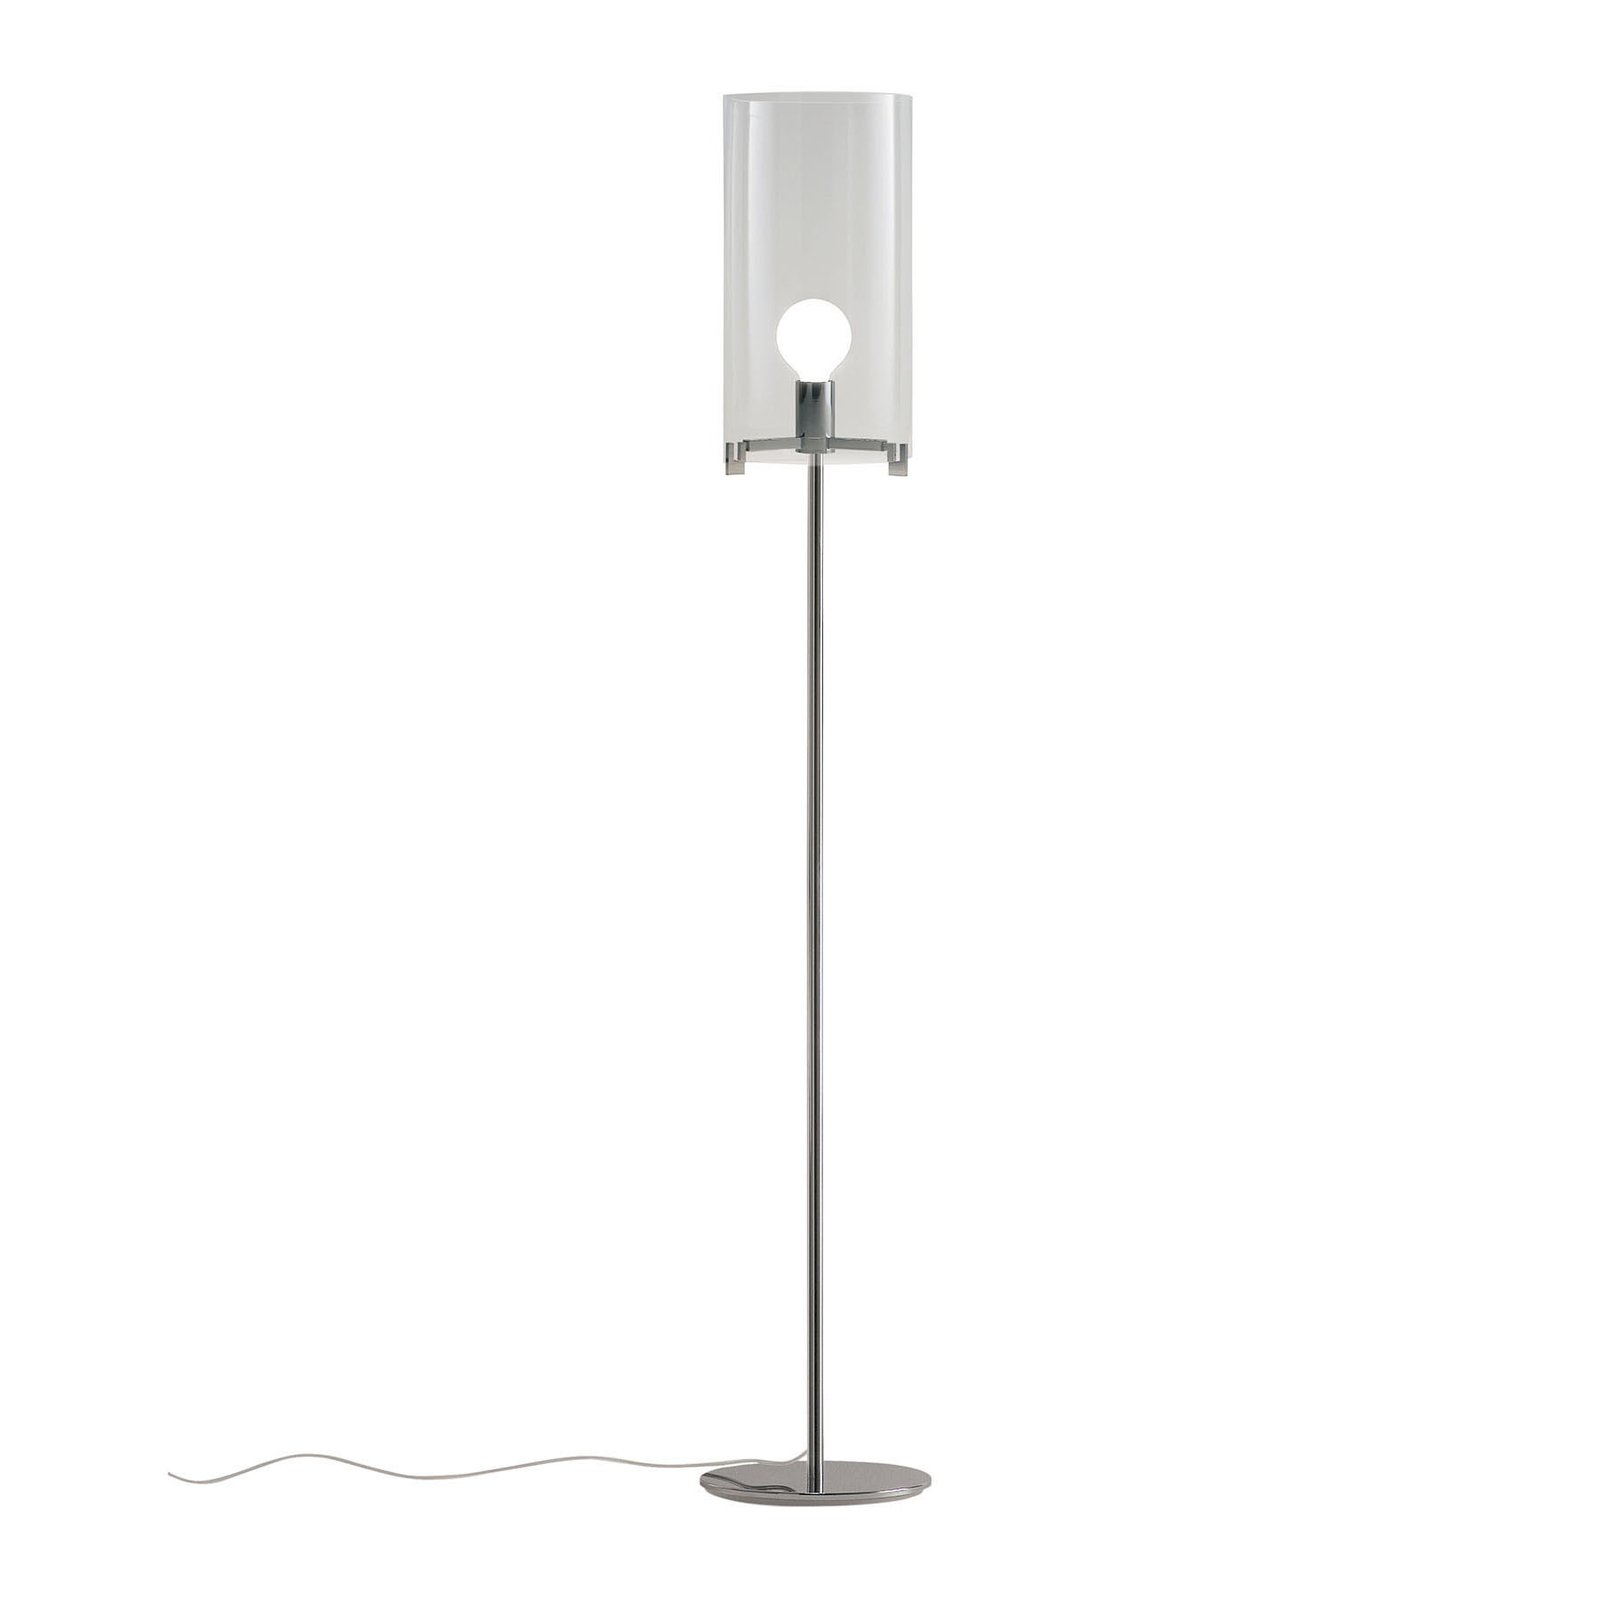 Prandina CPL F1 gulvlampe krom, glass transparent